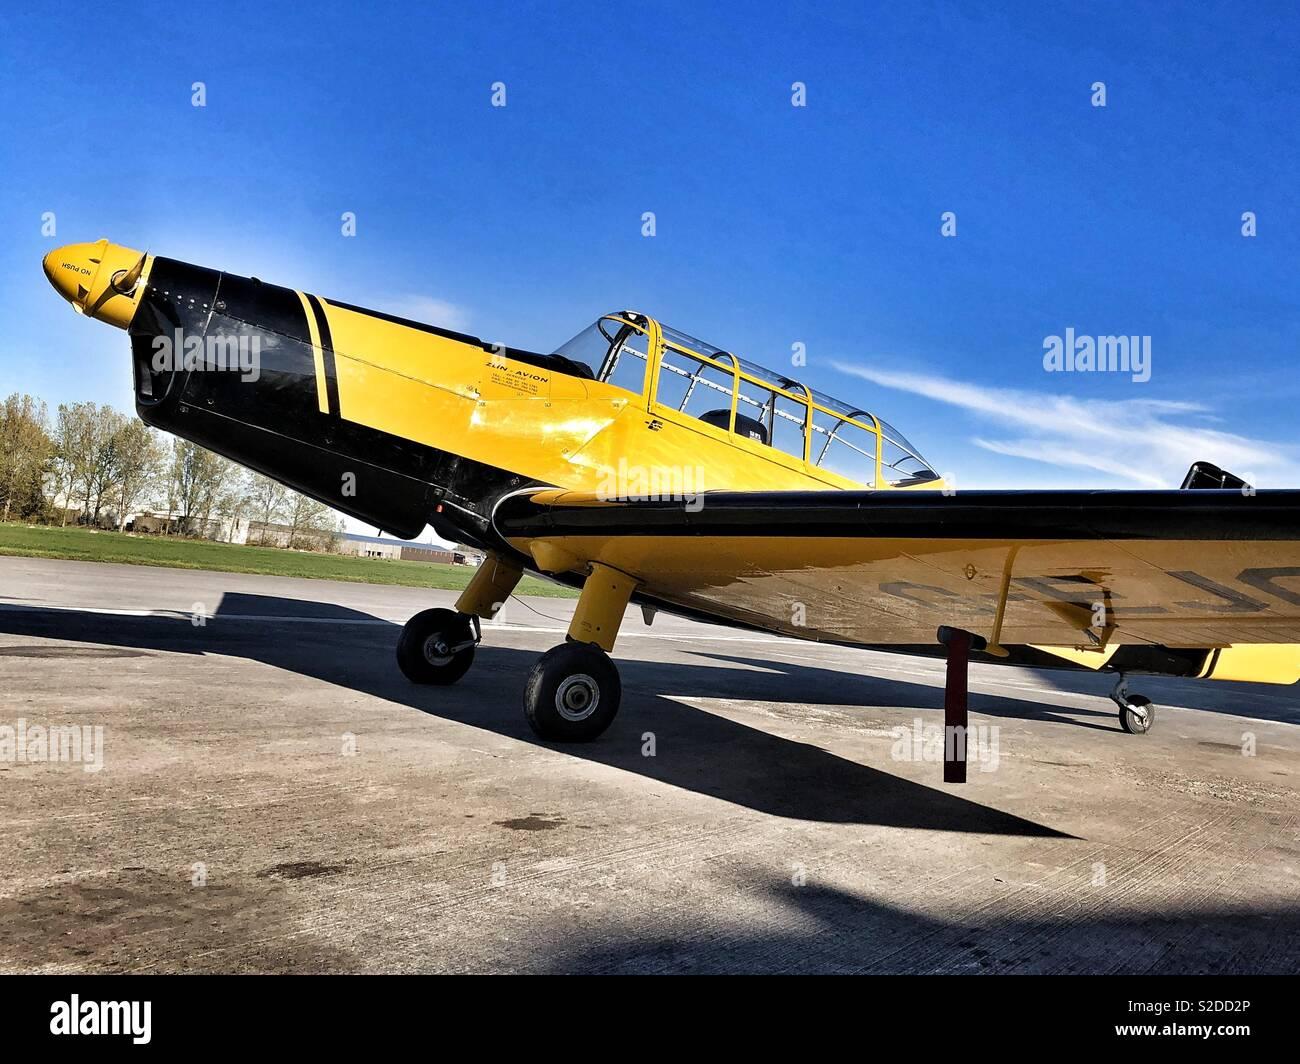 Zlin aerobatic aircraft - Stock Image